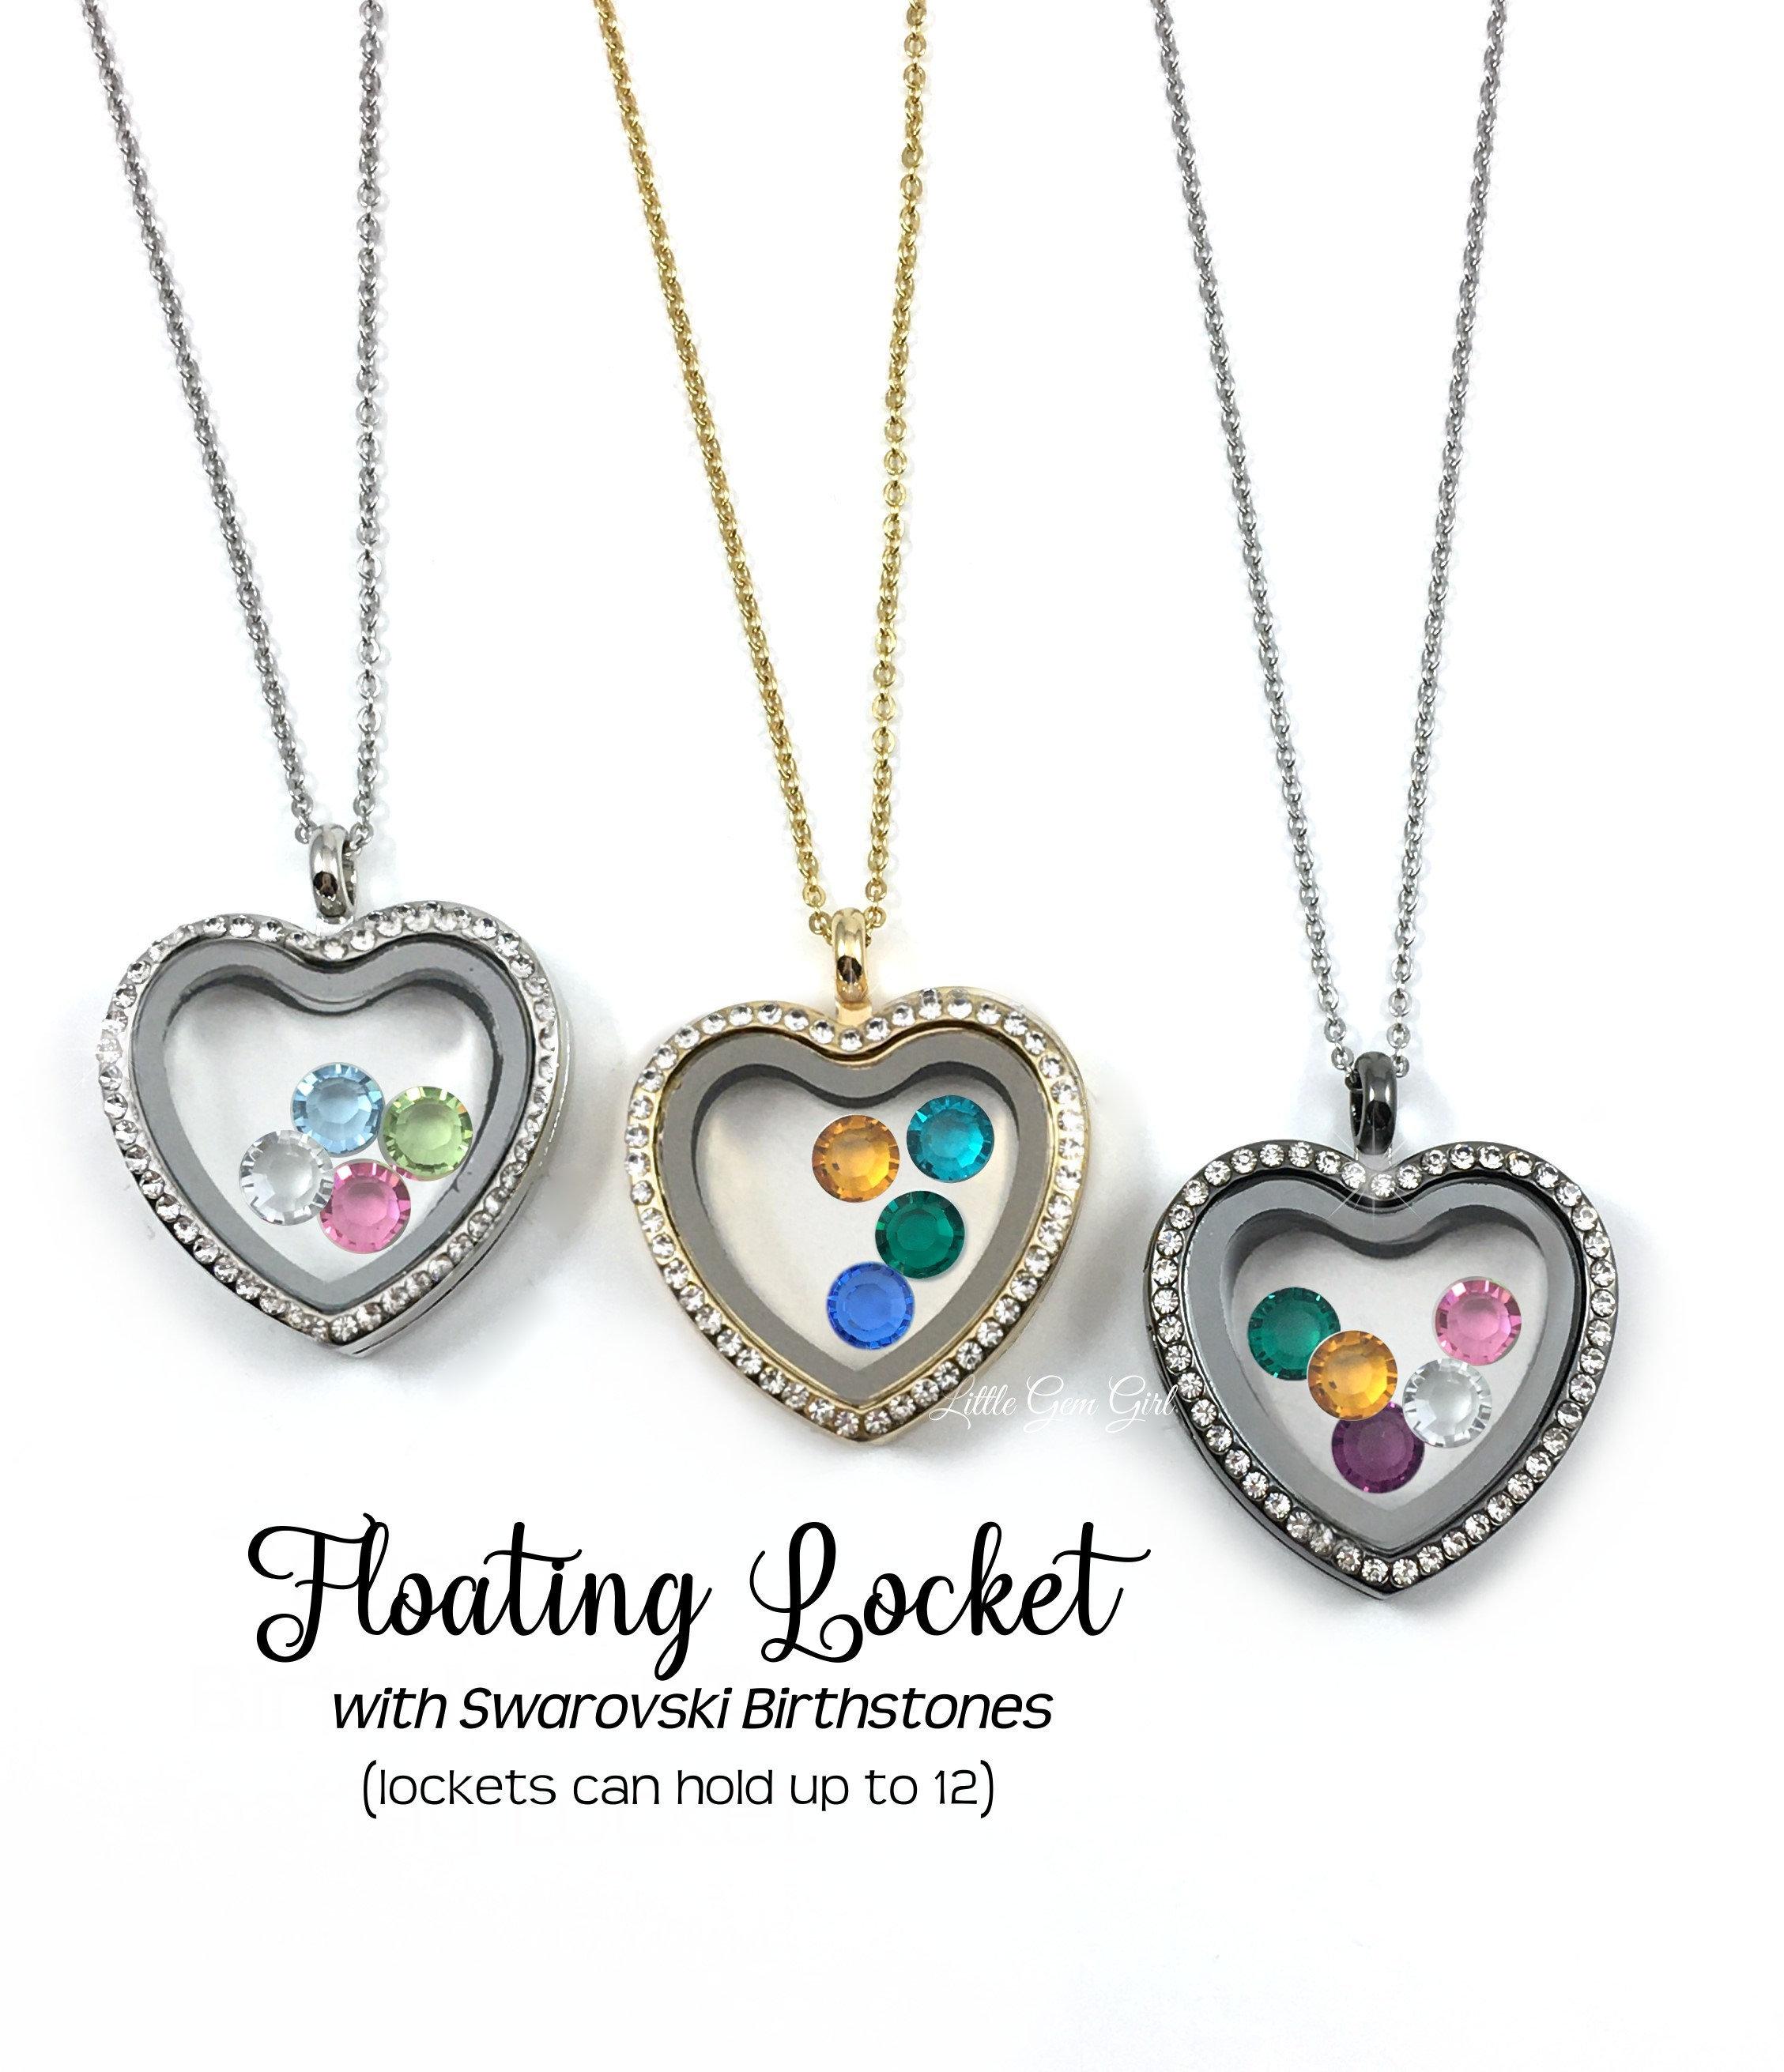 Floating Locket Charm and Birthstone Custom Name Floating Locket with Hearts